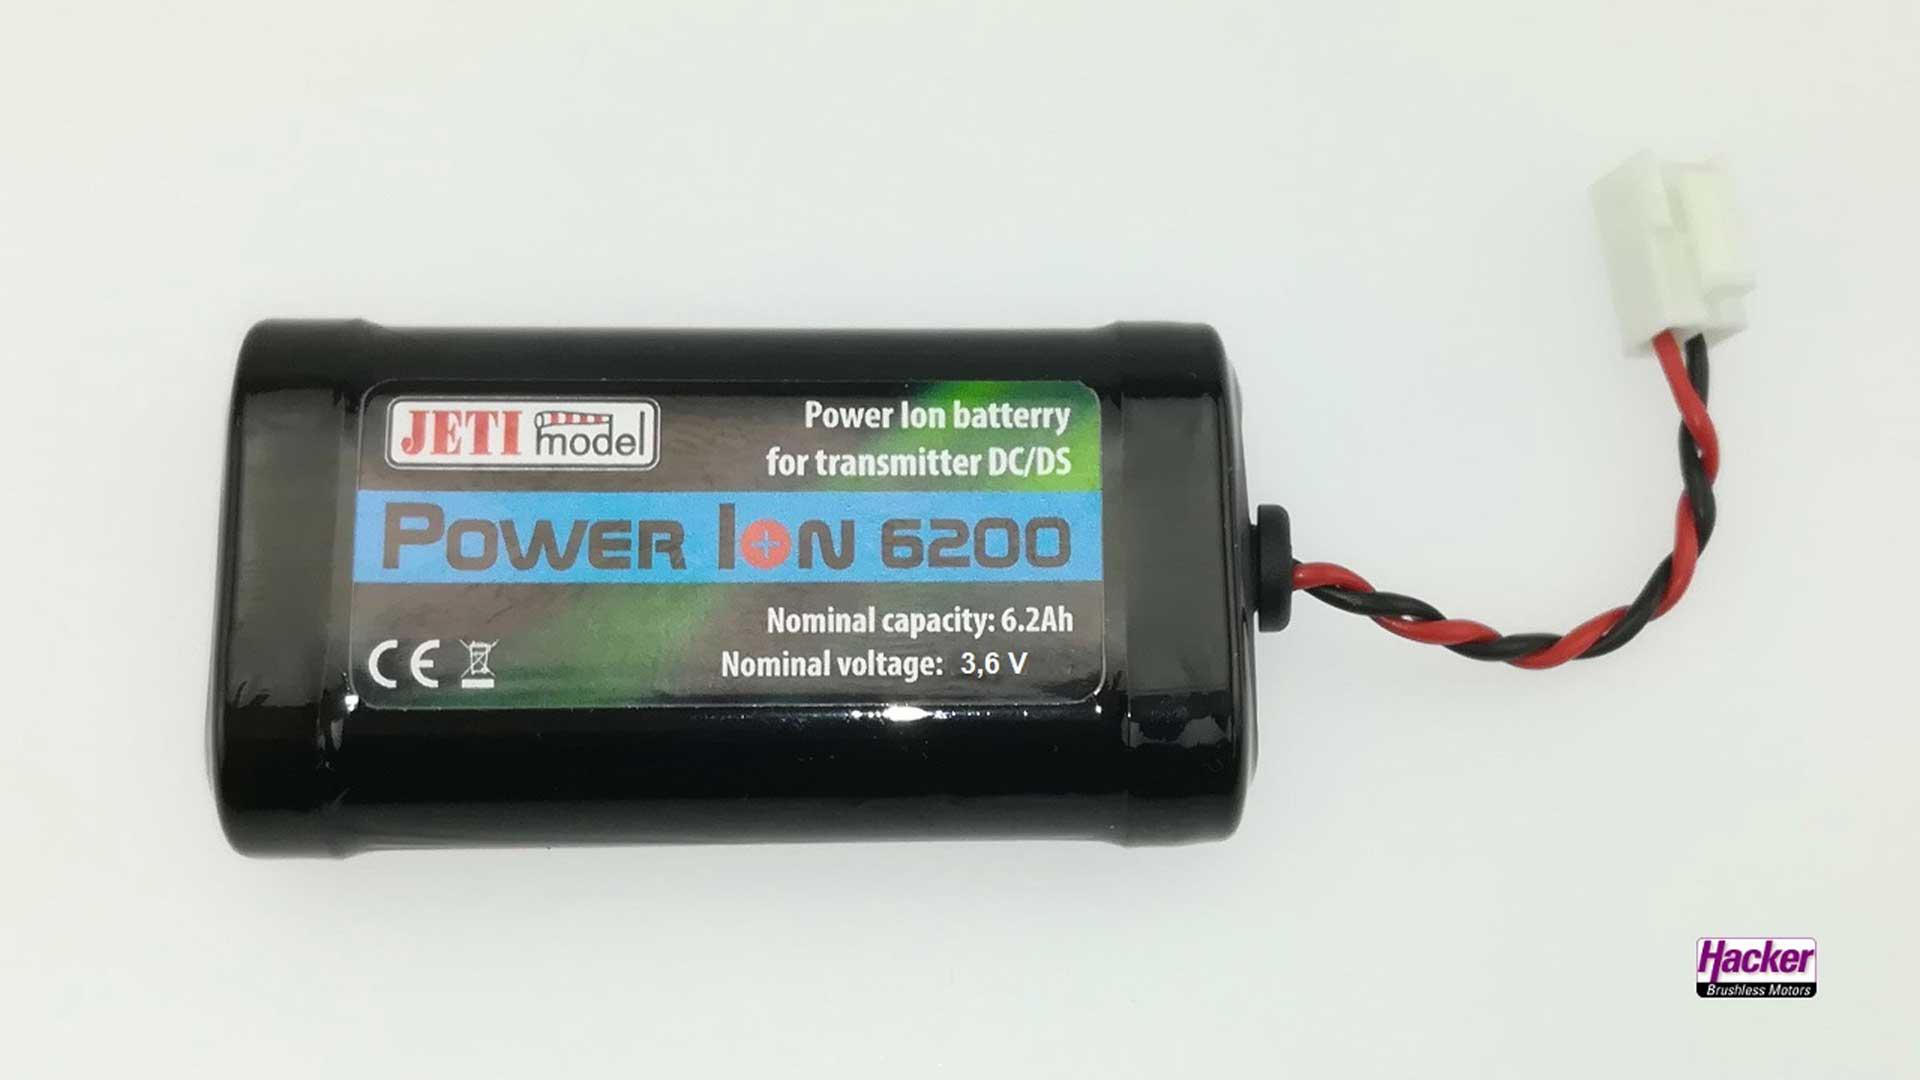 HACKER SENDERAKKU POWER ION 6200 DC/DS SENDER